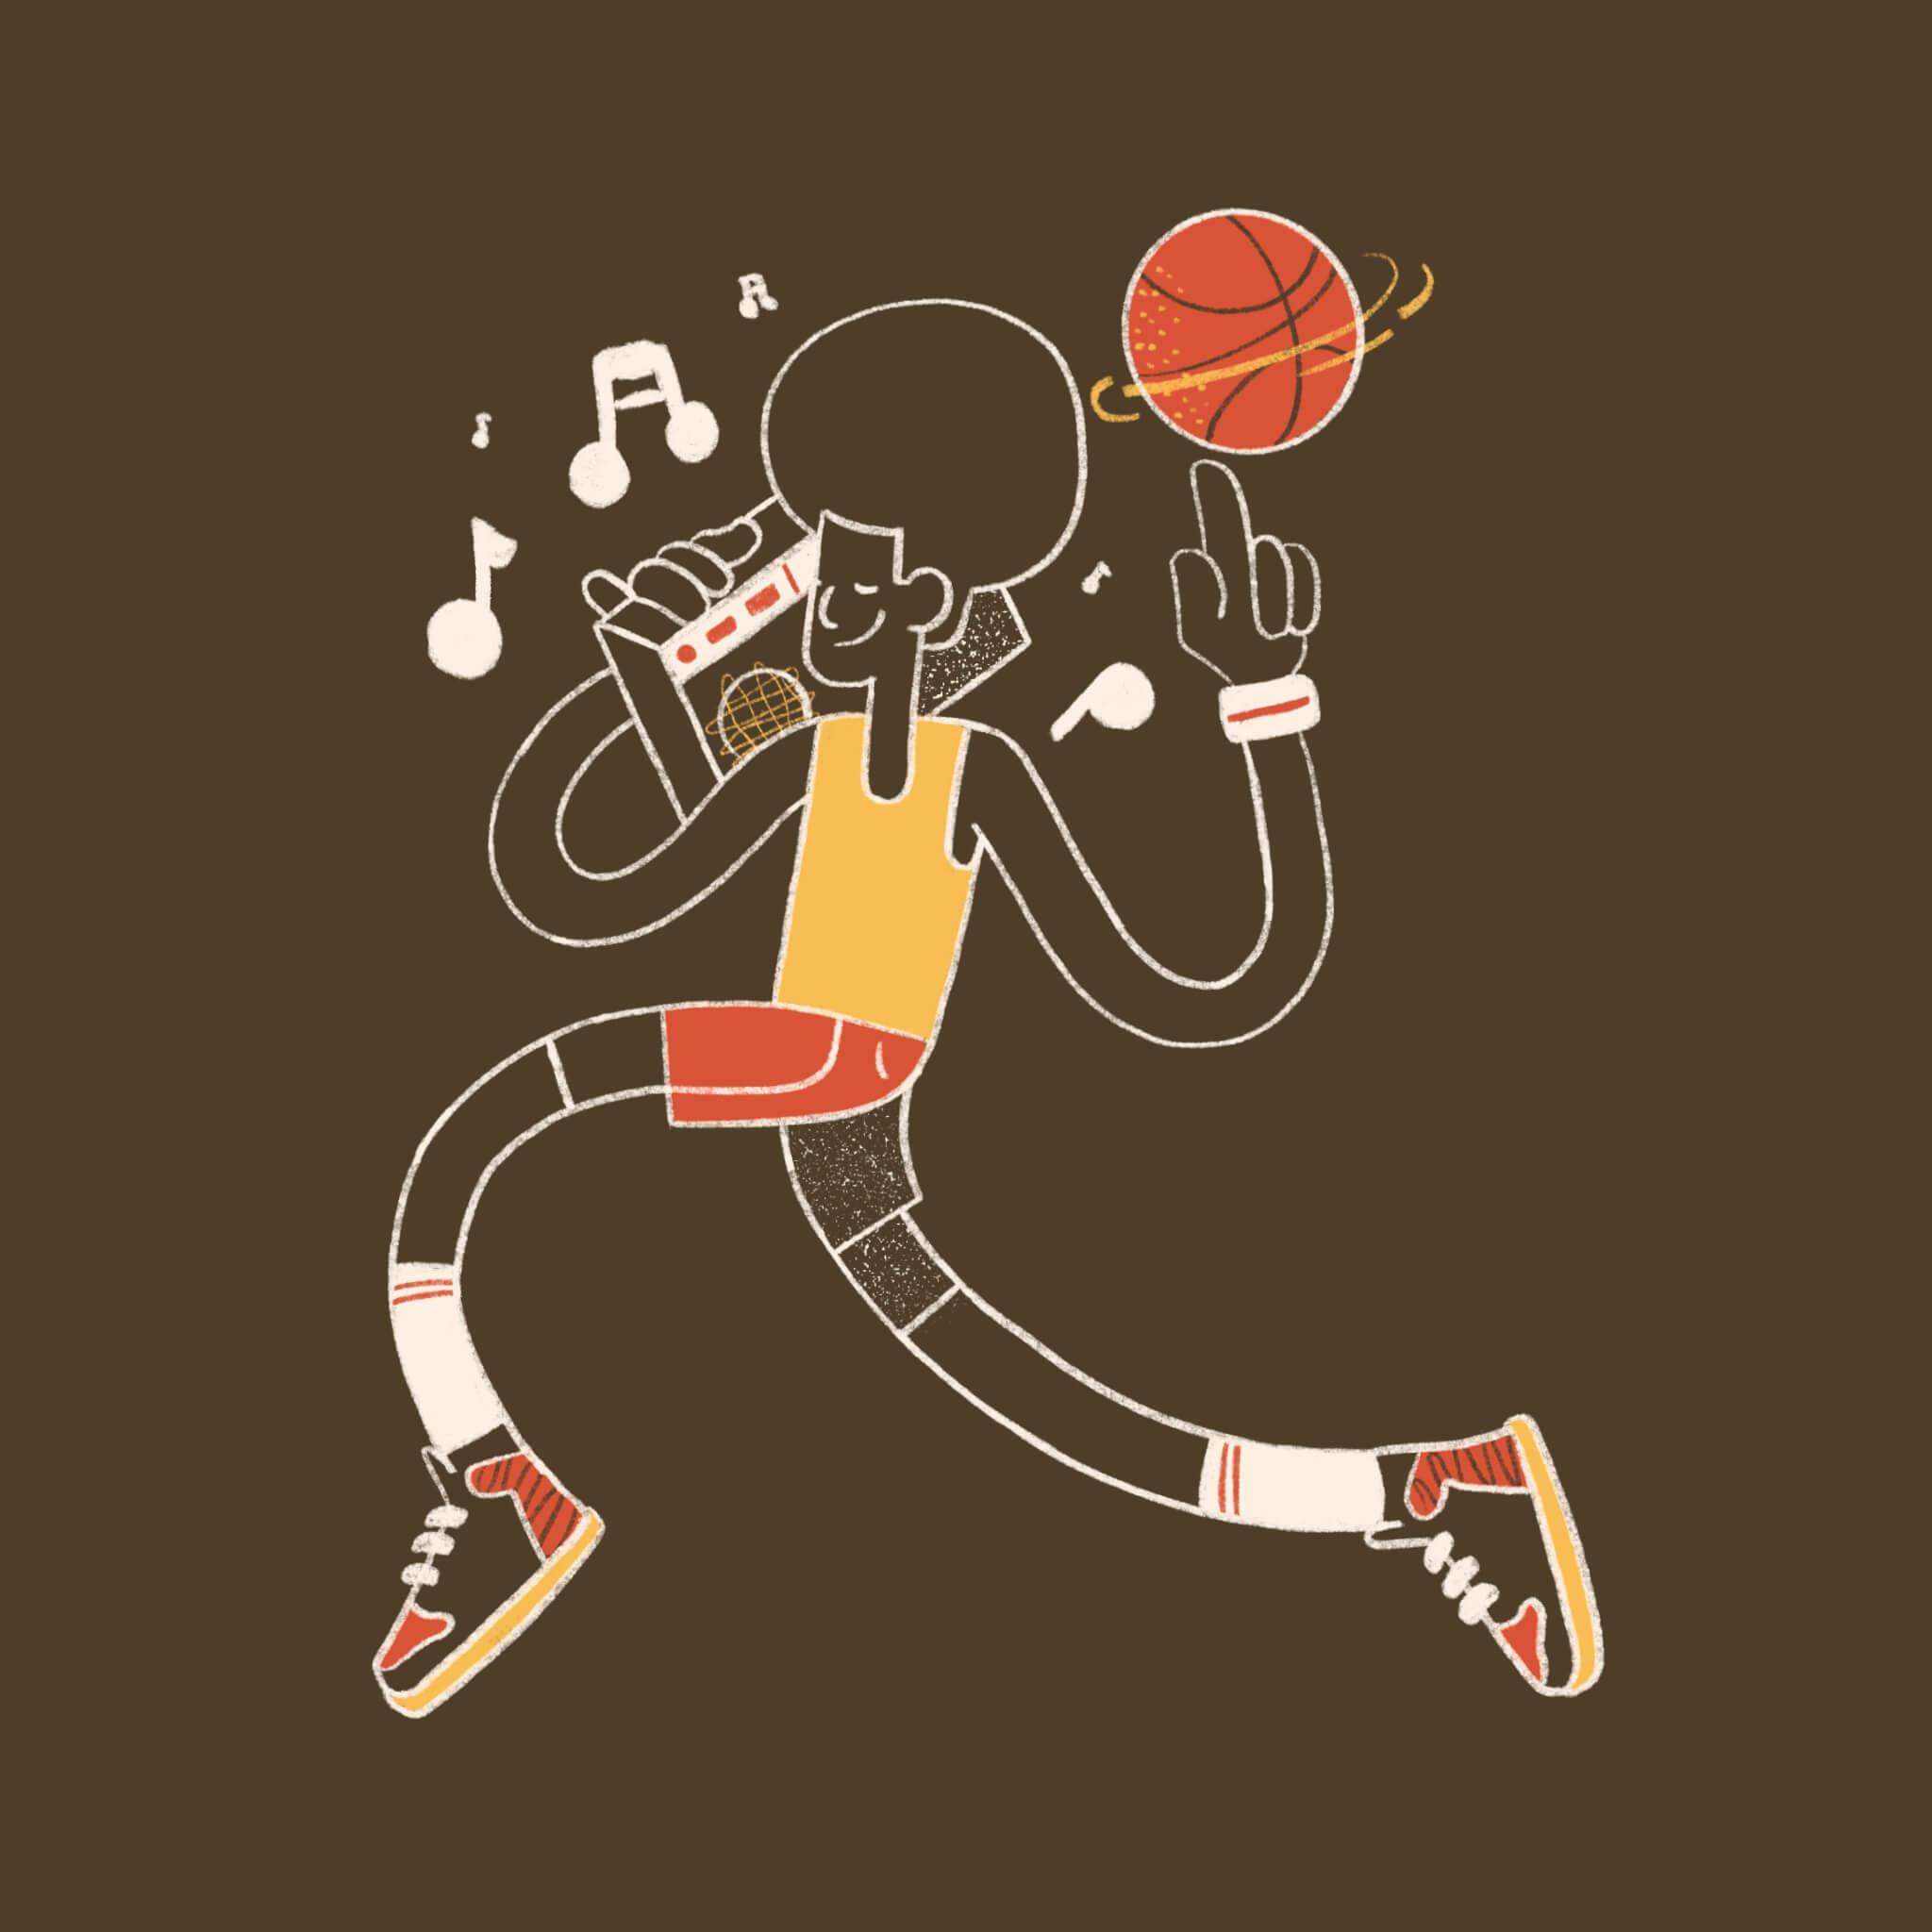 Basketboy-illustration-1